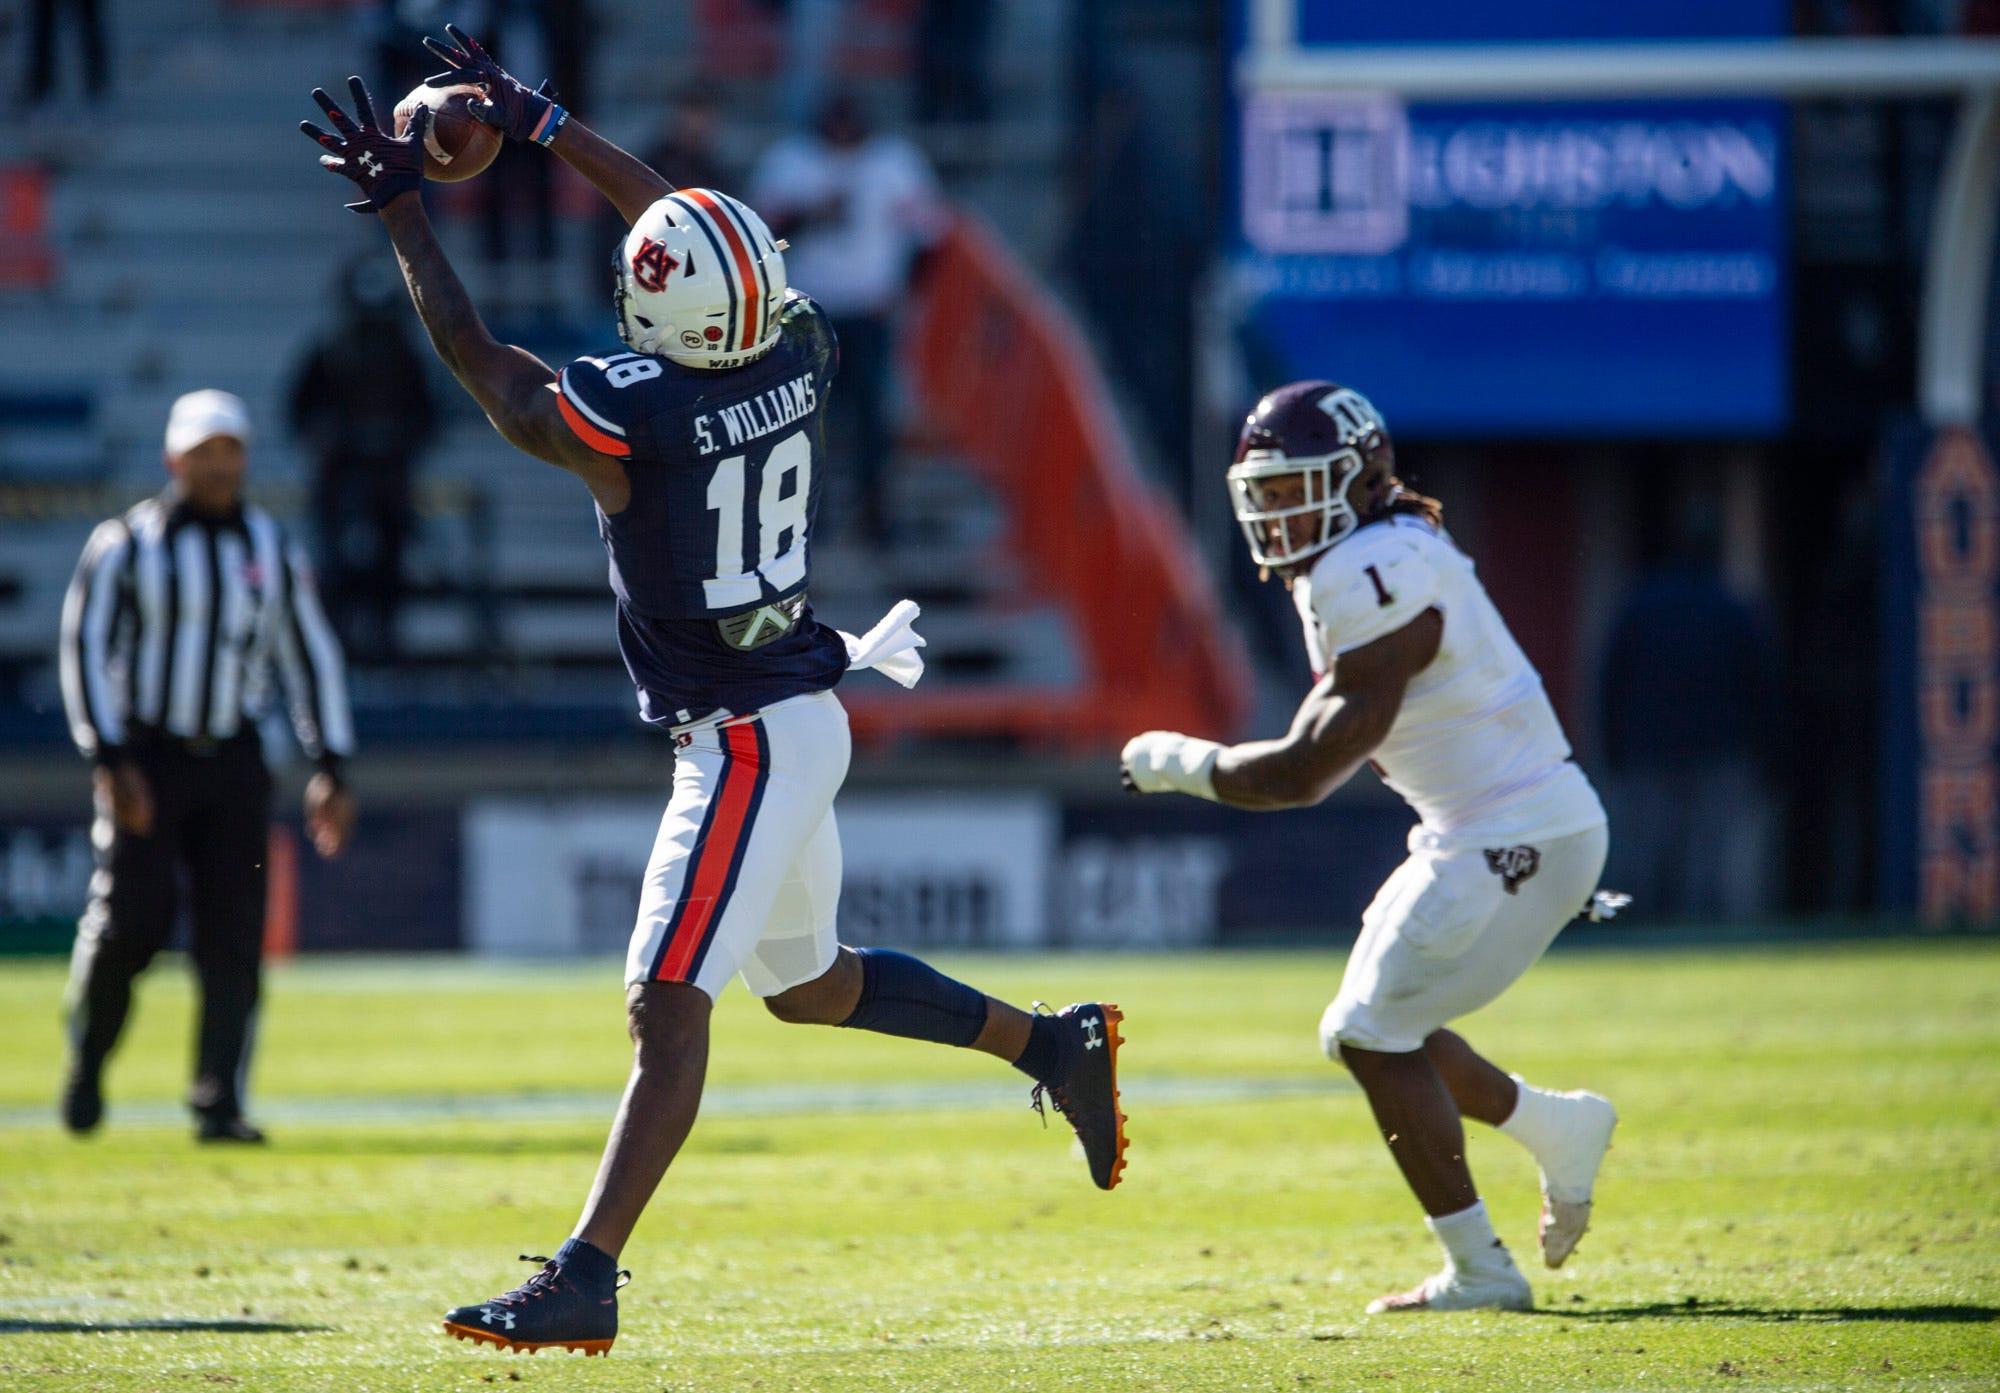 Auburn wide receiver Seth Williams (18) catches a pass at Jordan-Hare Stadium in Auburn, Ala., on Saturday, Dec. 5, 2020. Texas A&M defeated Auburn 31-20.